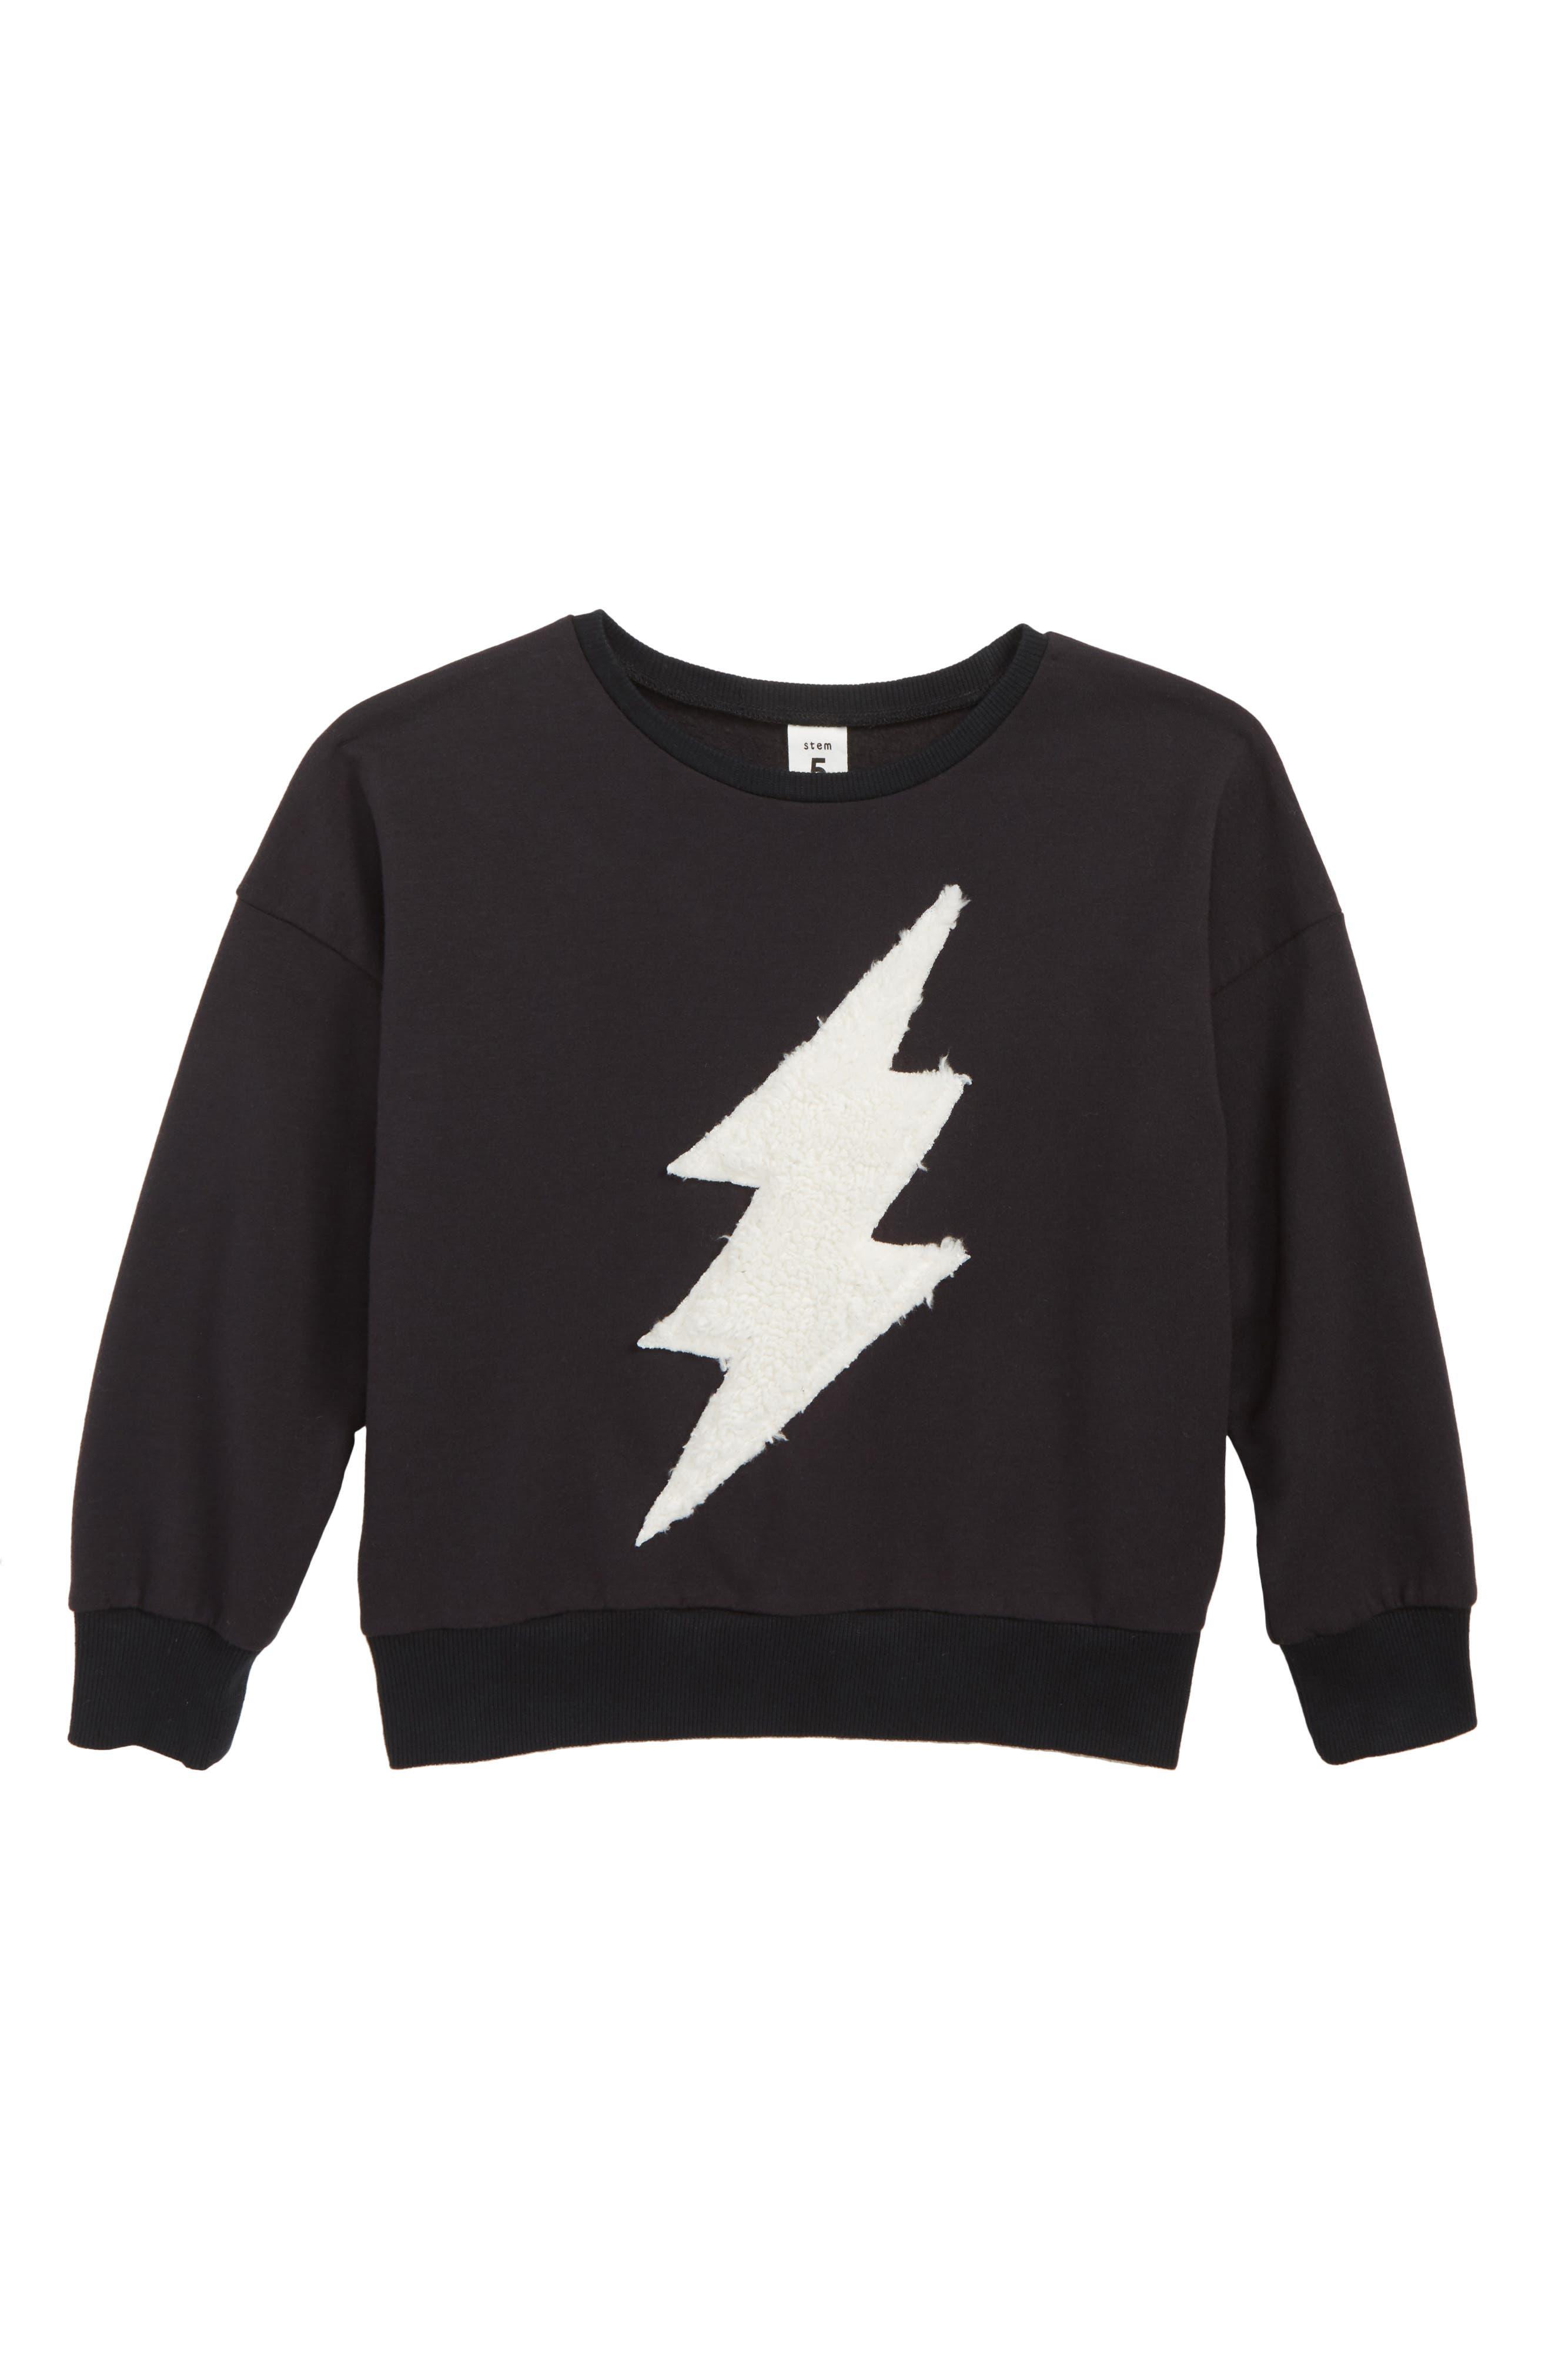 Lightning Appliqué Sweater, Main, color, BLACK BOLD BOLT